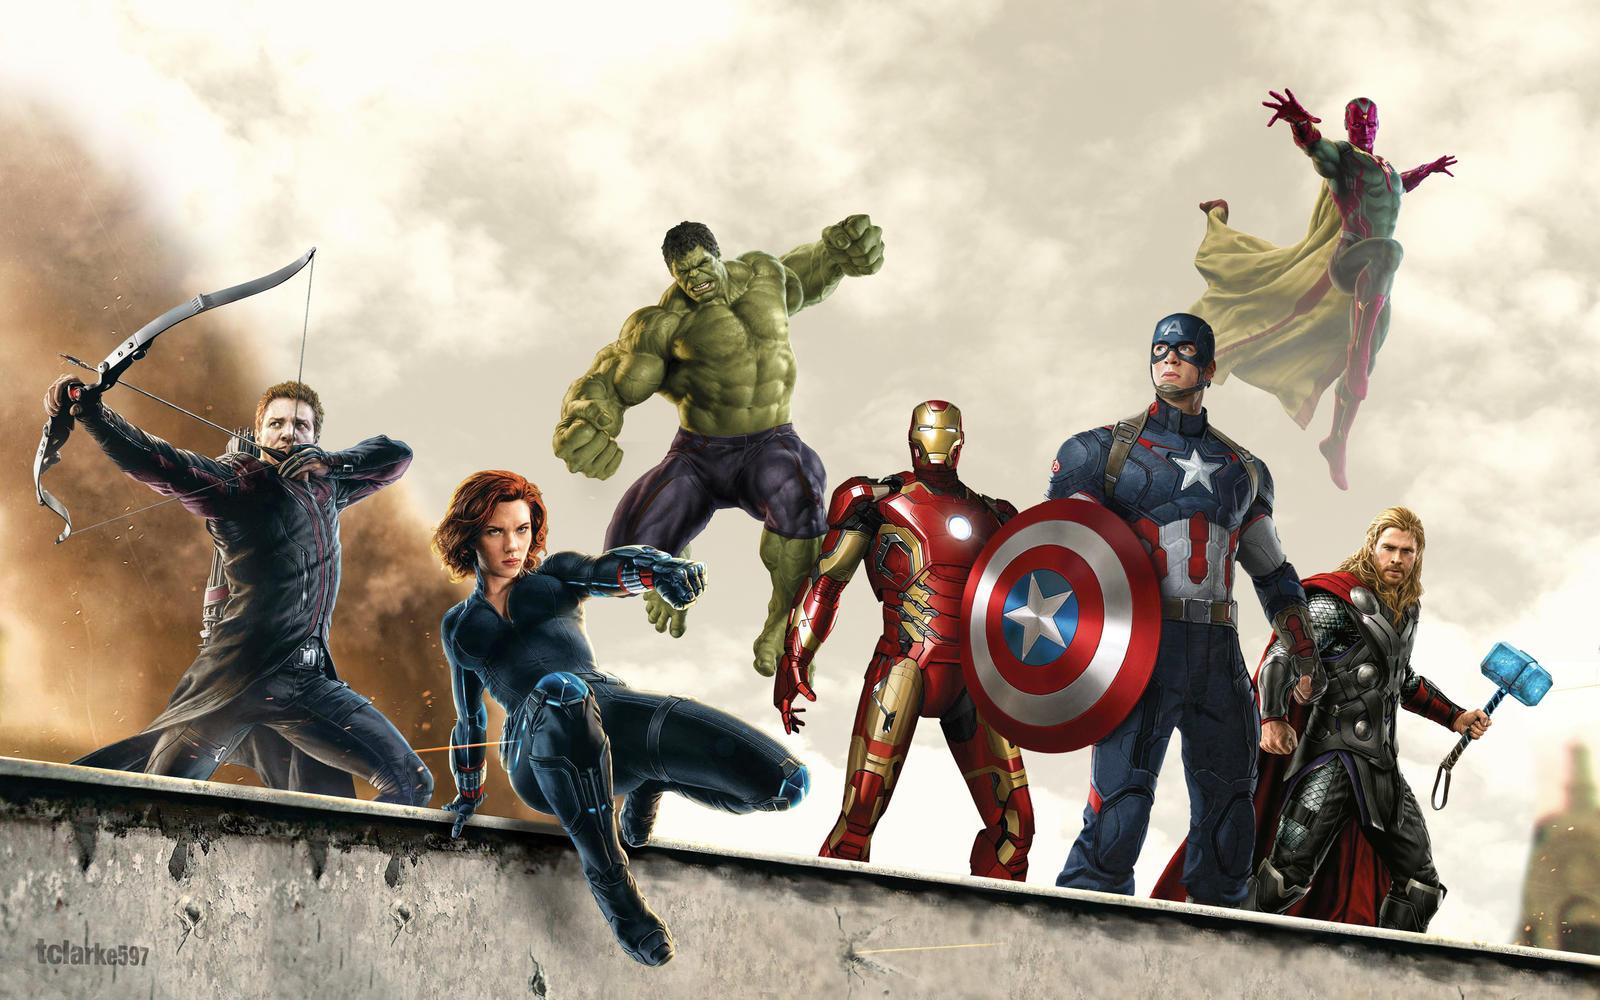 Avengers Wallpaper by tclarke597